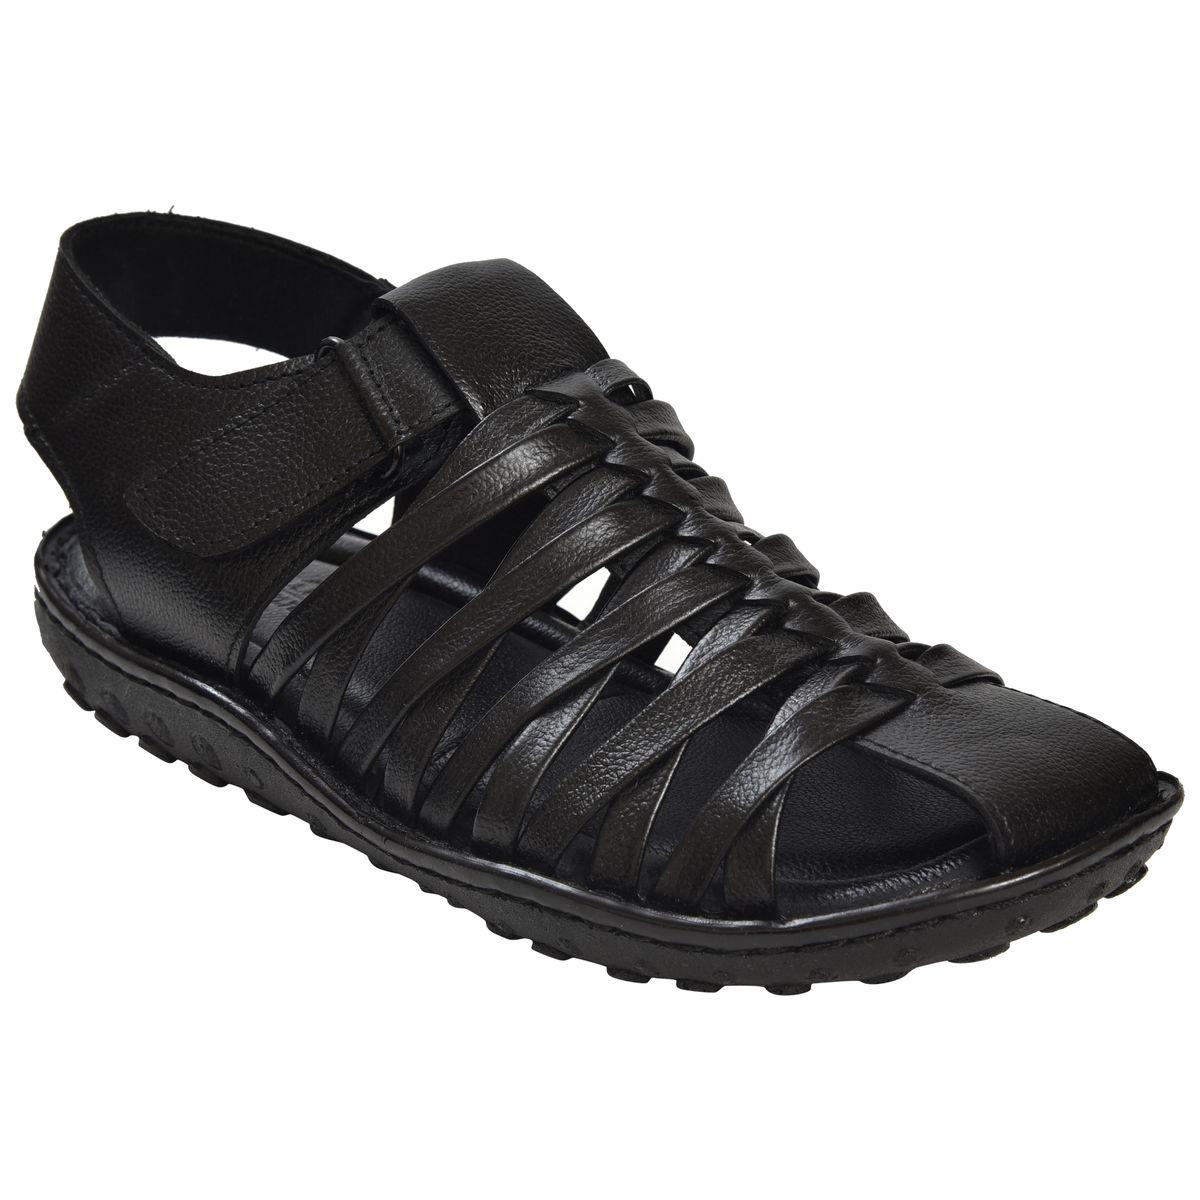 Ajanta Mens Office Sandals - Black GB0409